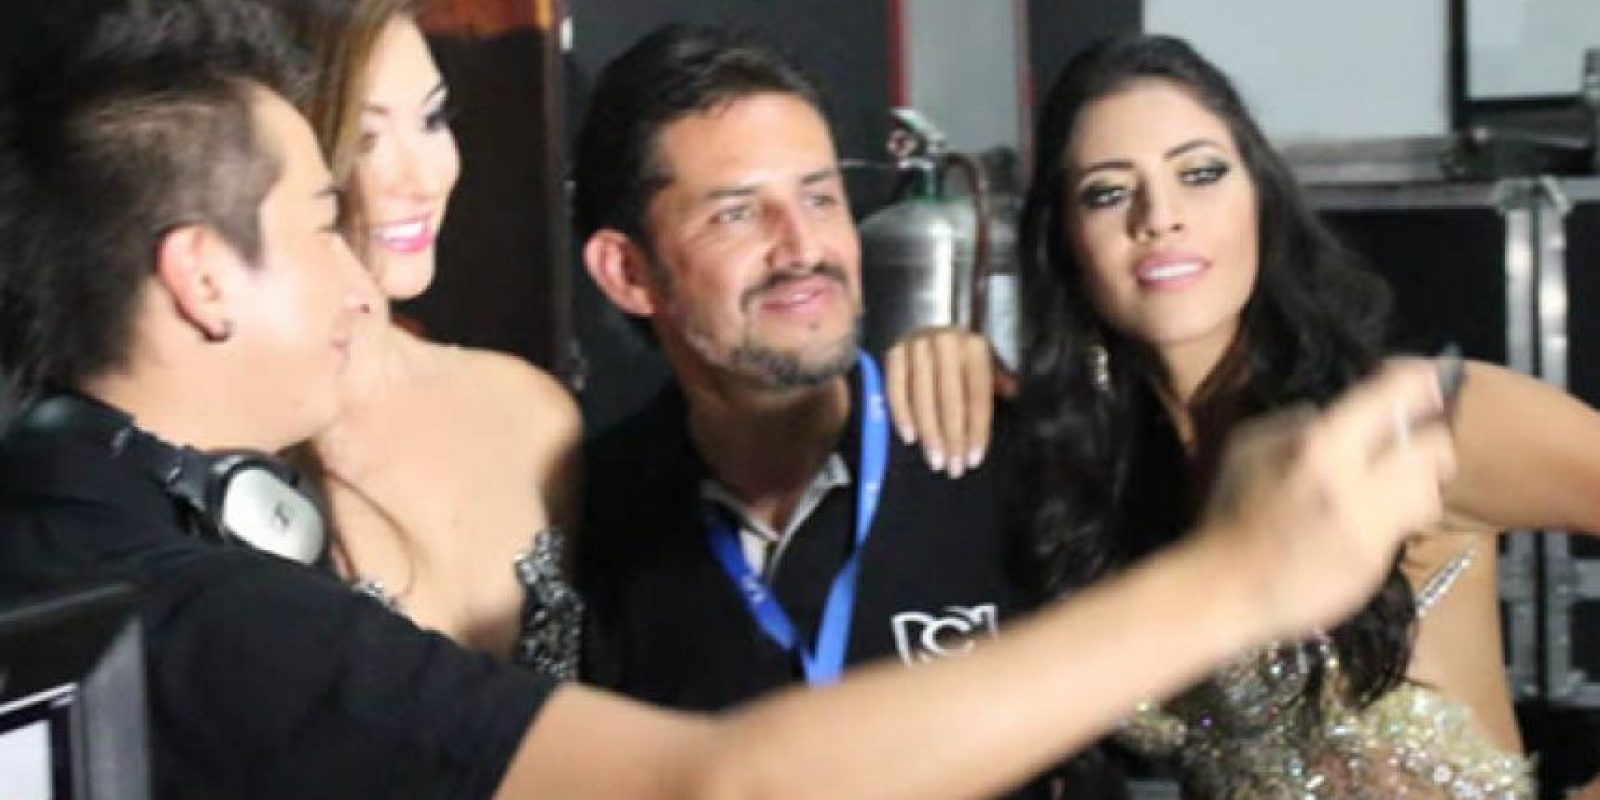 Foto:Canal RCN – http://www.canalrcn.com/reinado